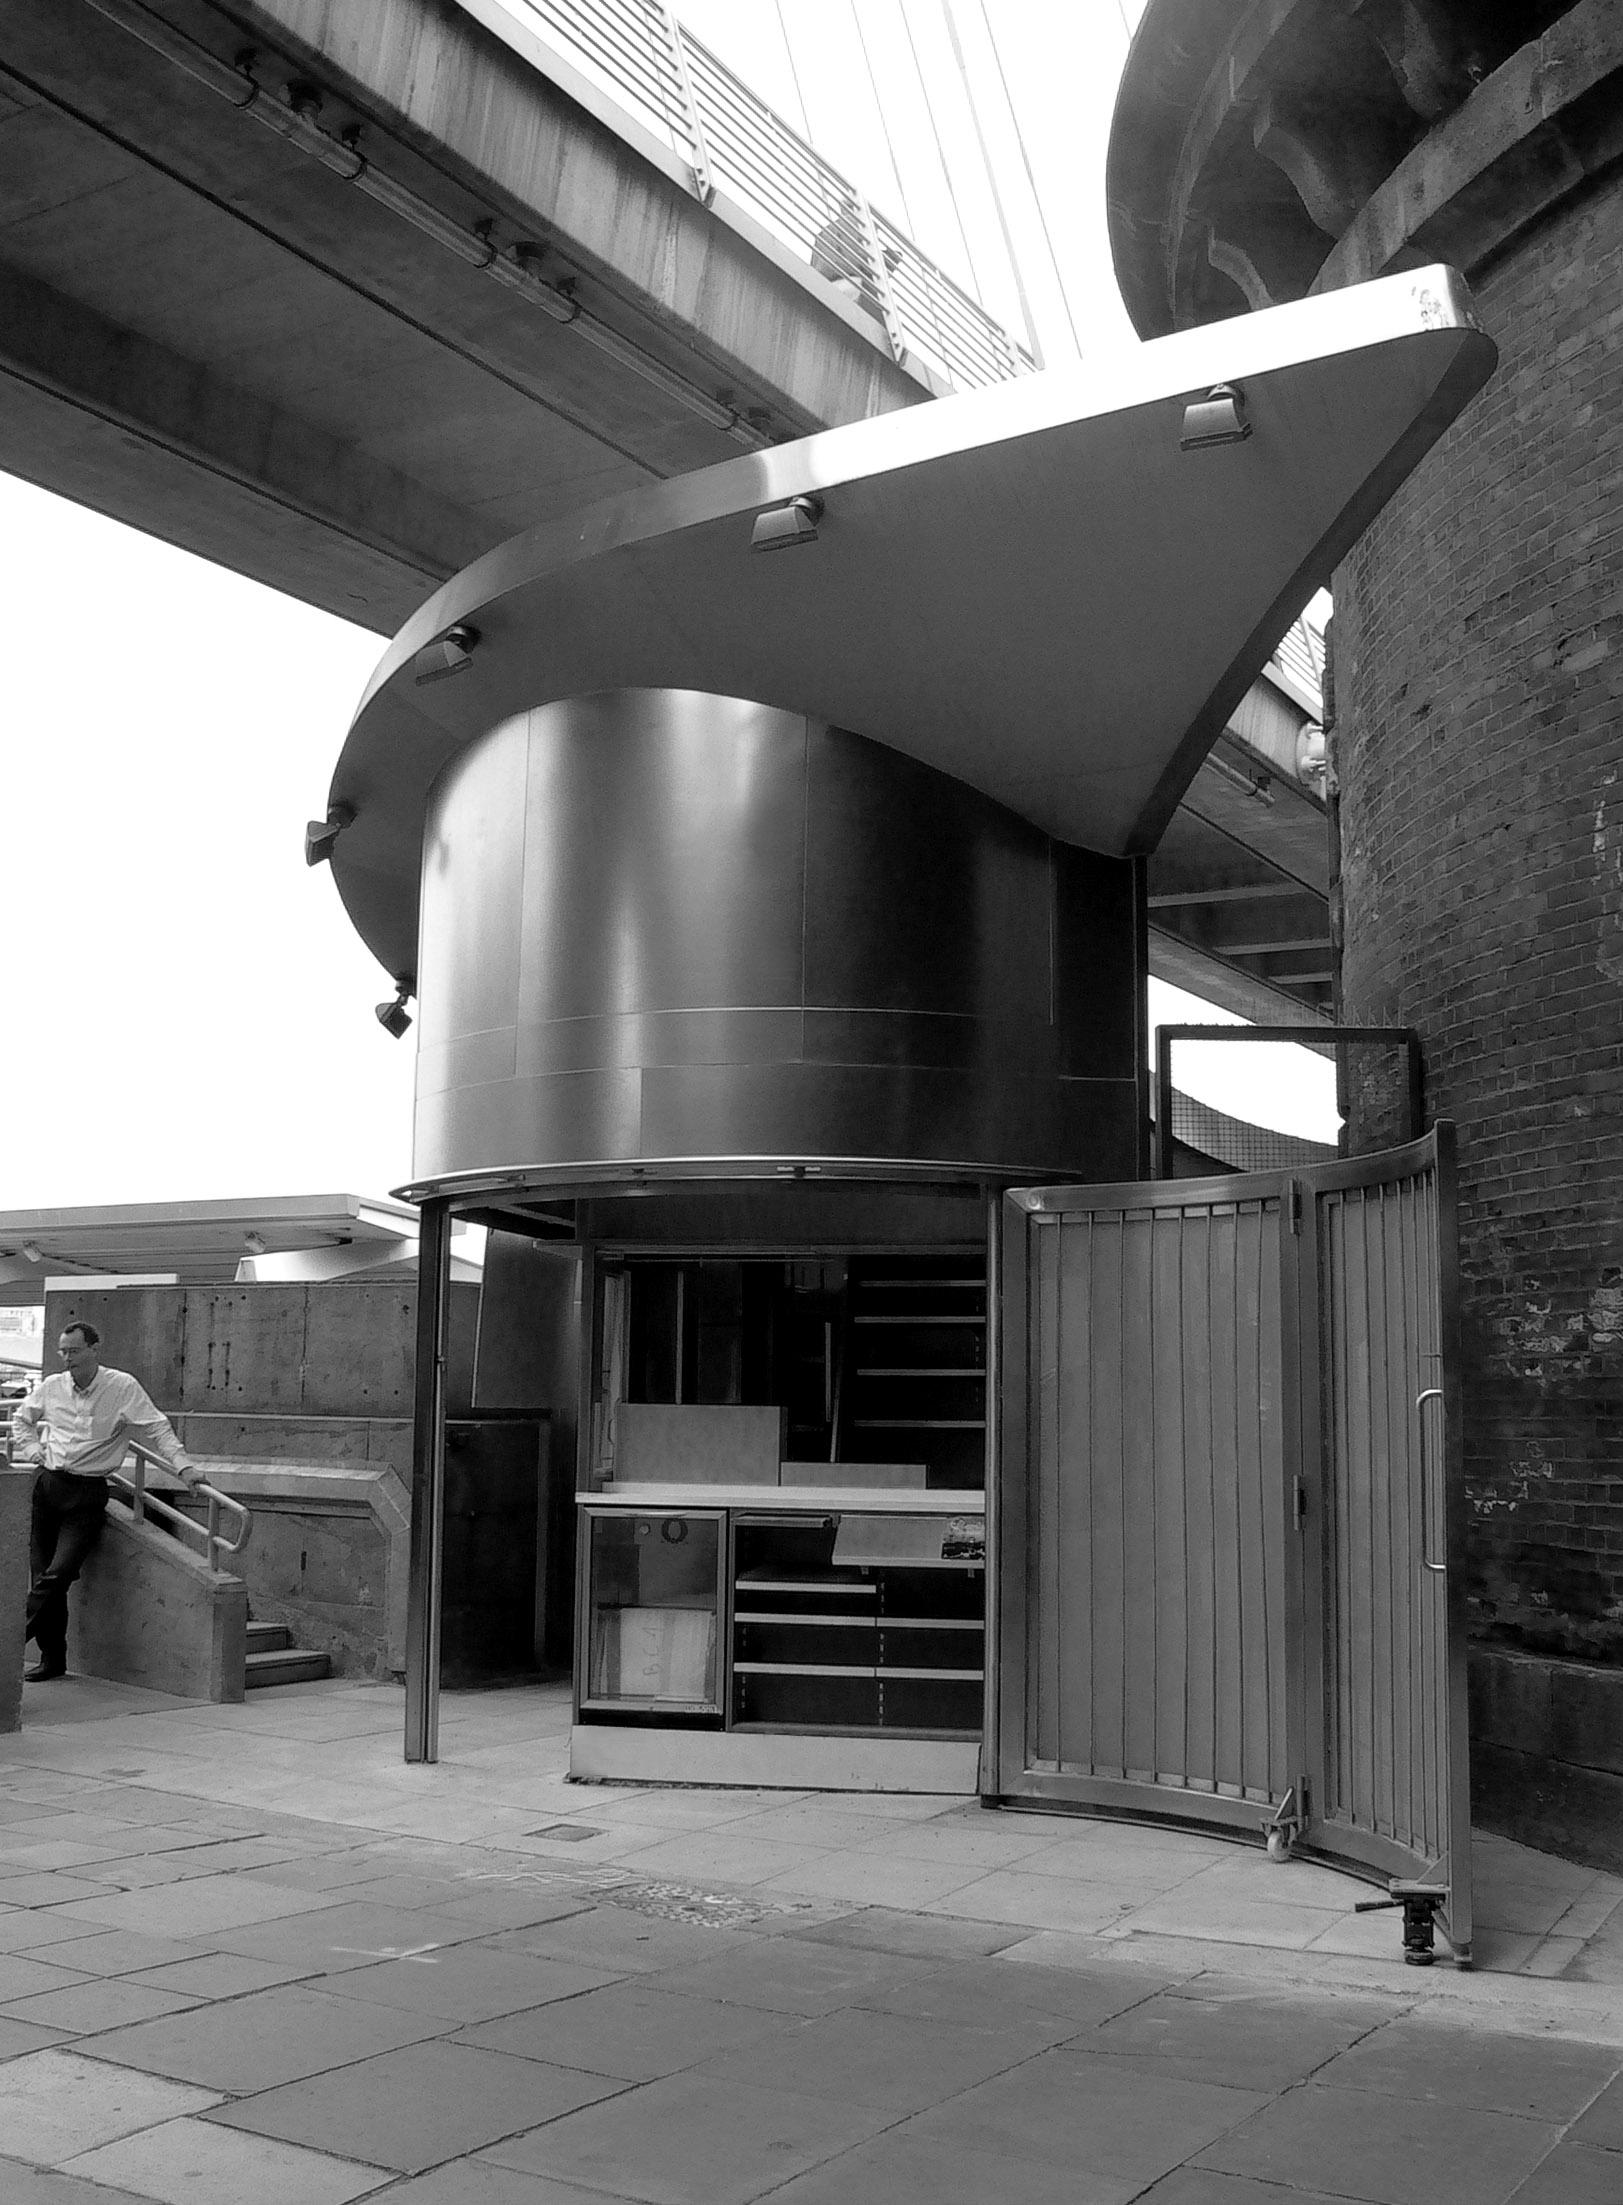 Bianchini-e-Lusiardi-associati-Cleopatra-s-kiosk-London-July-2007-works-in-progress-bn